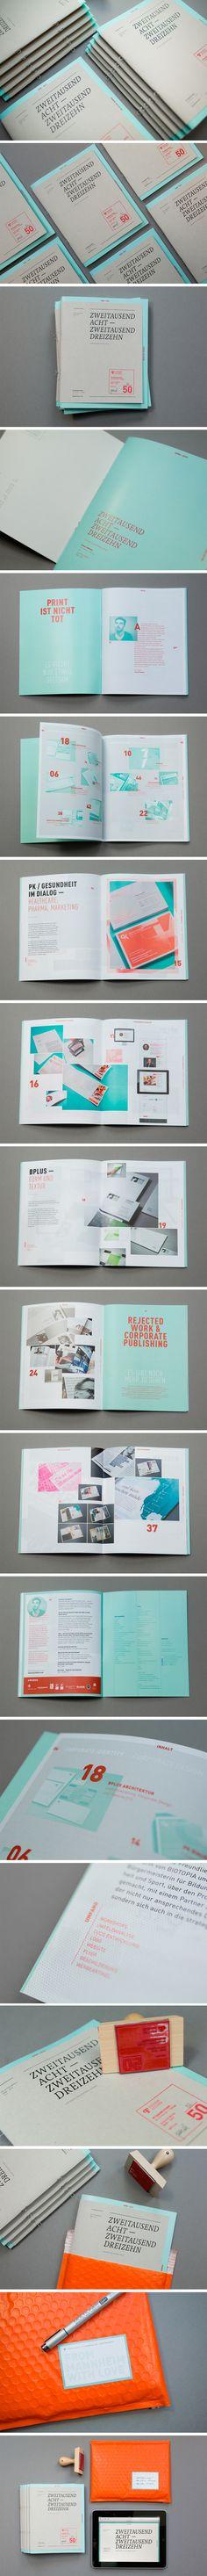 88 Best portfolio images in 2019 | Editorial design, Page